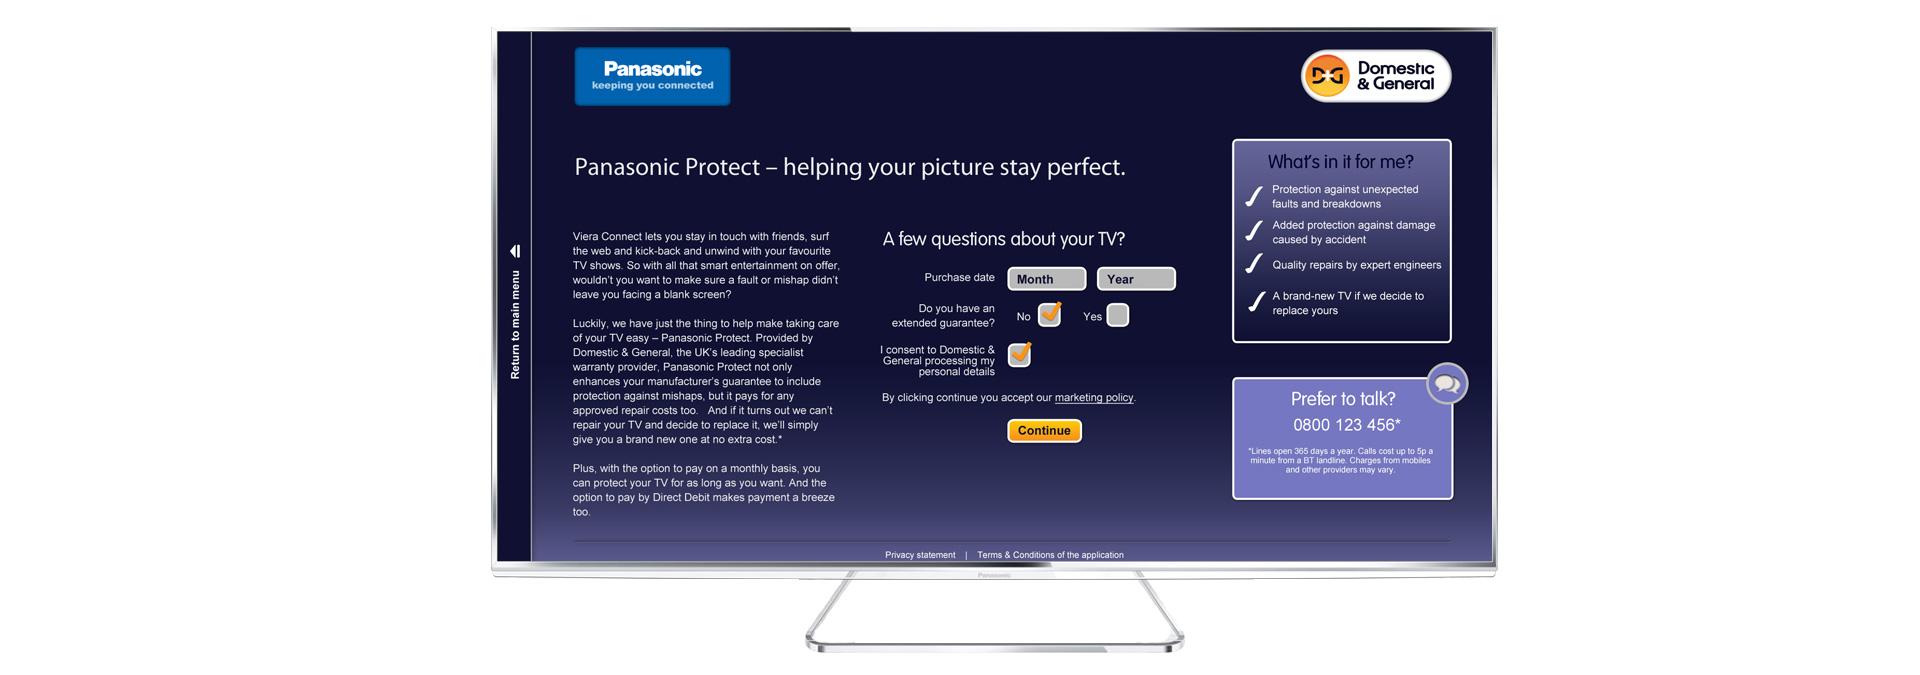 panasonic smart tv app 2013 chris. Black Bedroom Furniture Sets. Home Design Ideas